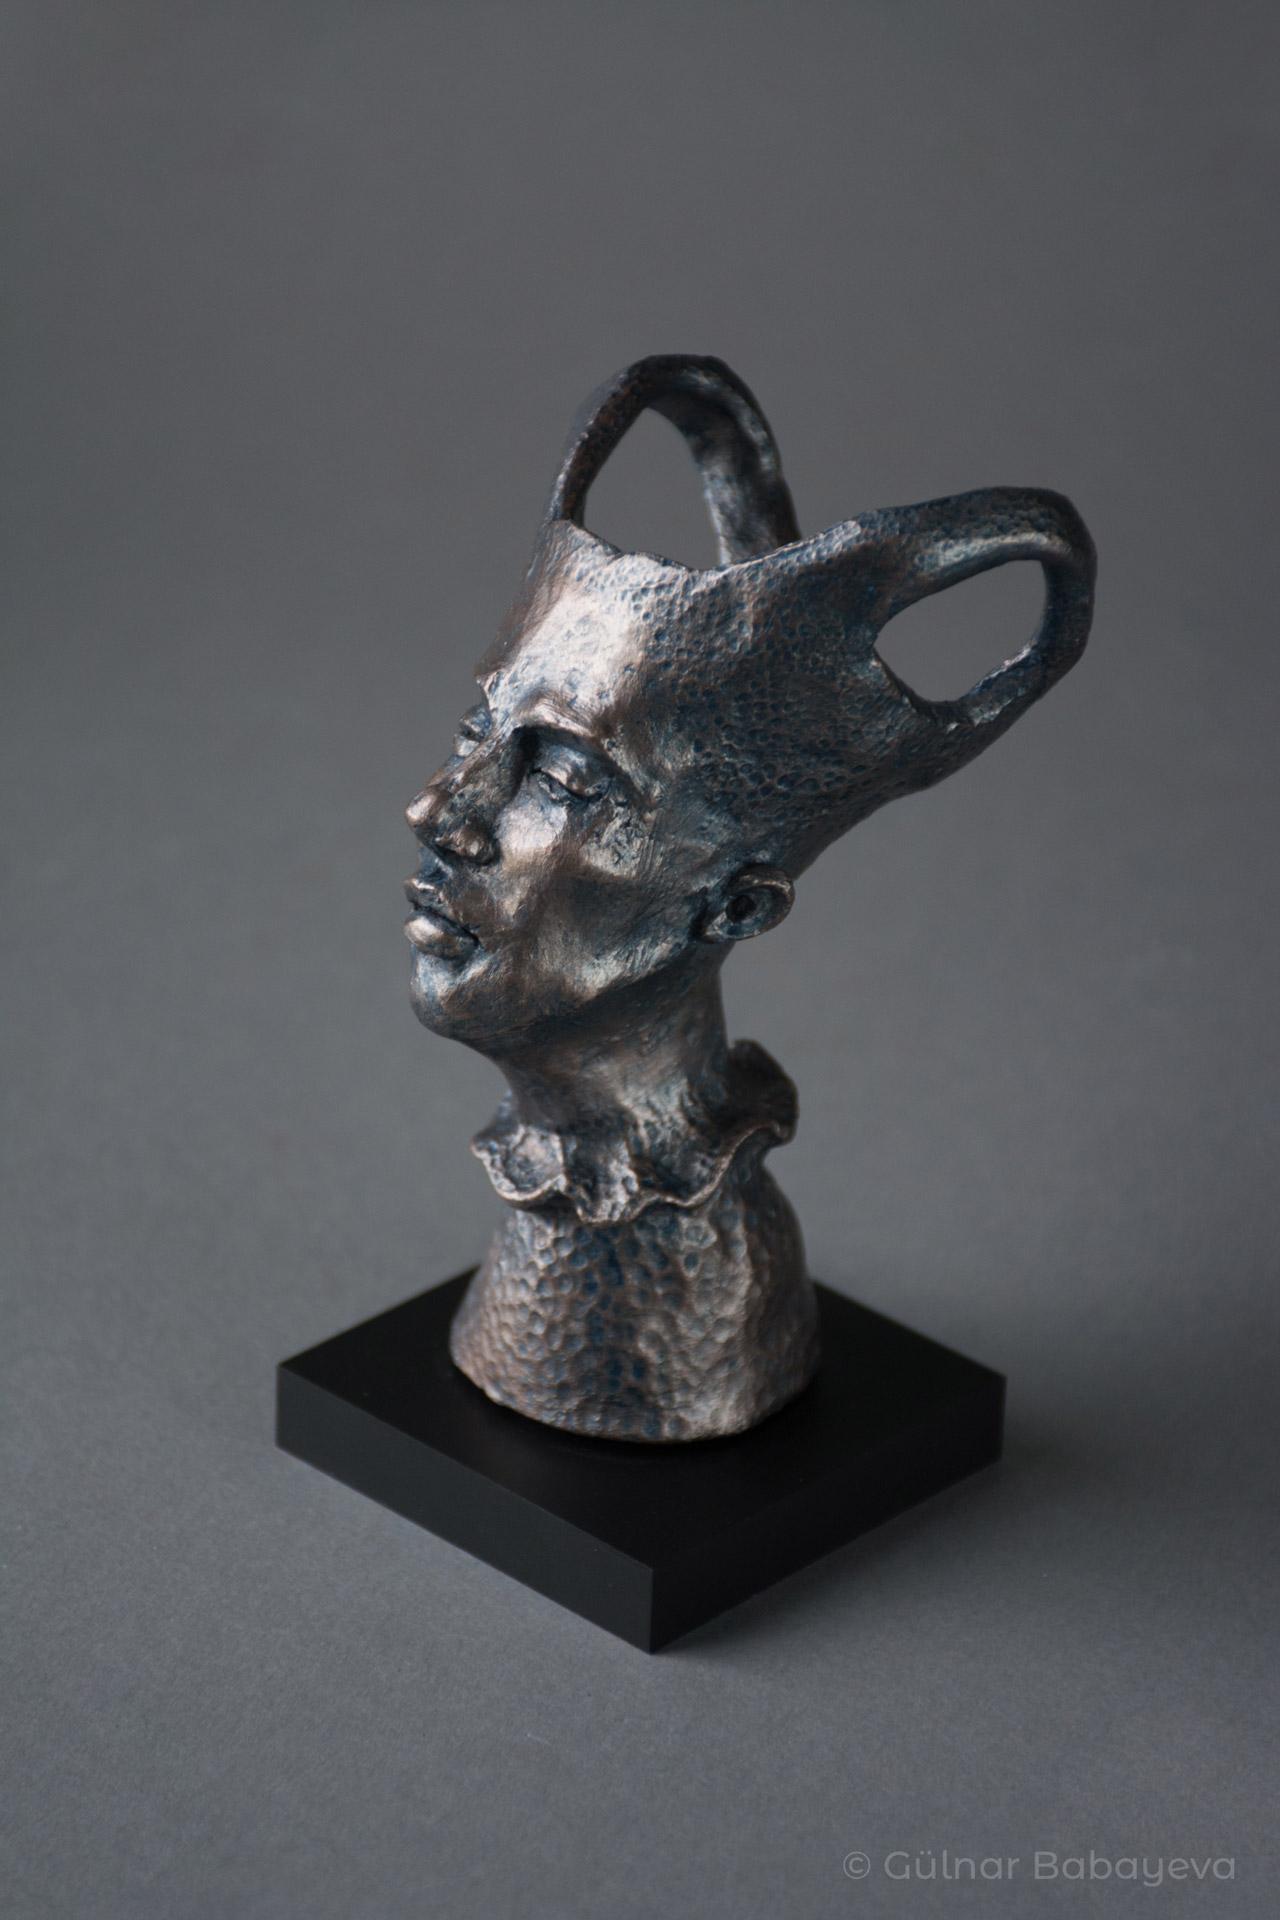 GülnarBabayeva_VesselOfRebirth_2020_Ceramic_5Hx3.5Wx3.5D-c1f2698d